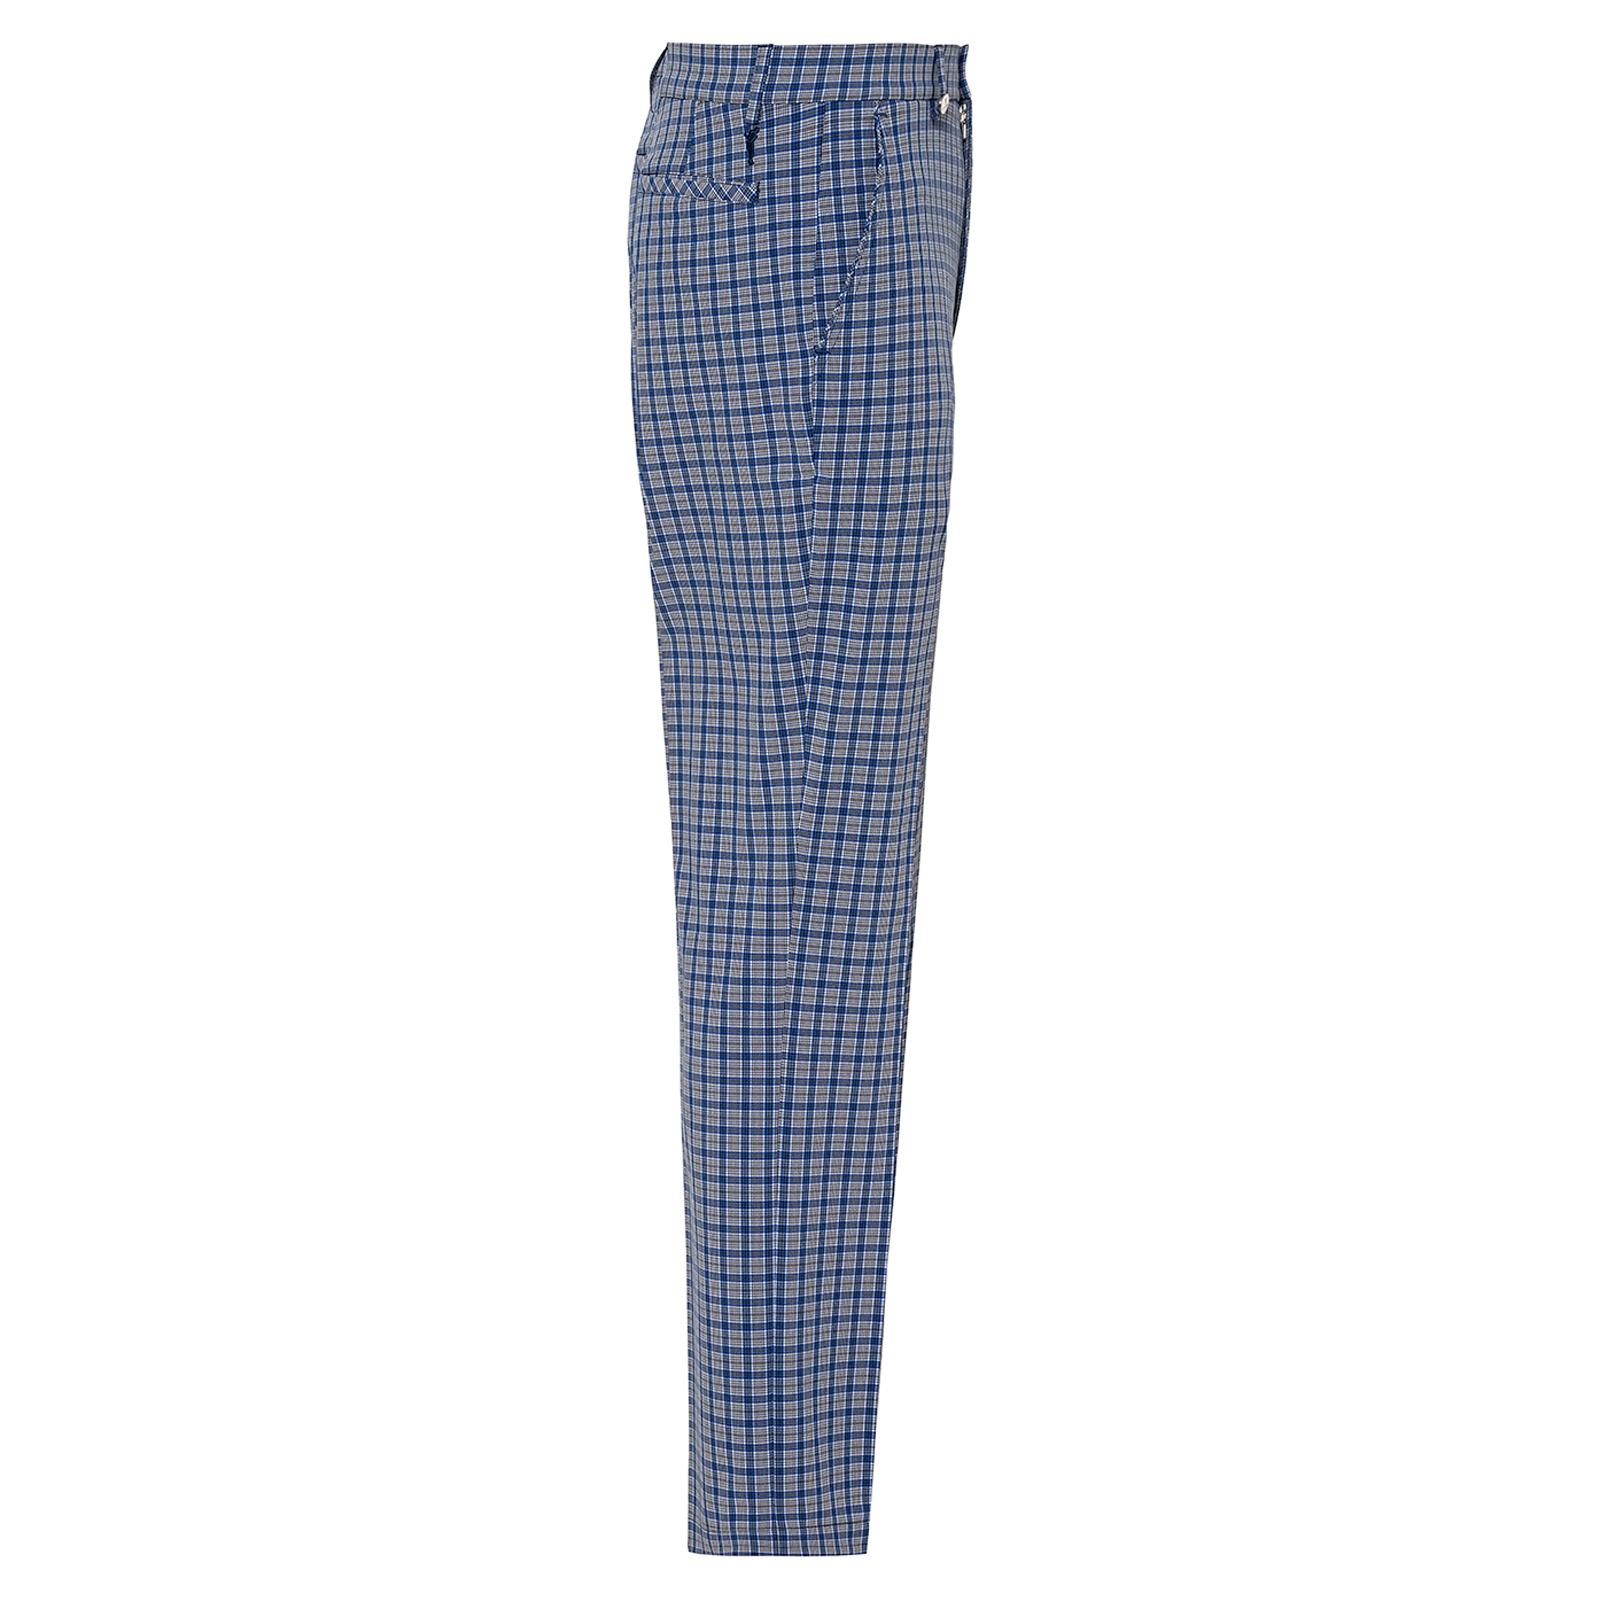 Herren Karo-Golfhose mit Extra Stretch Komfort in Slim Fit